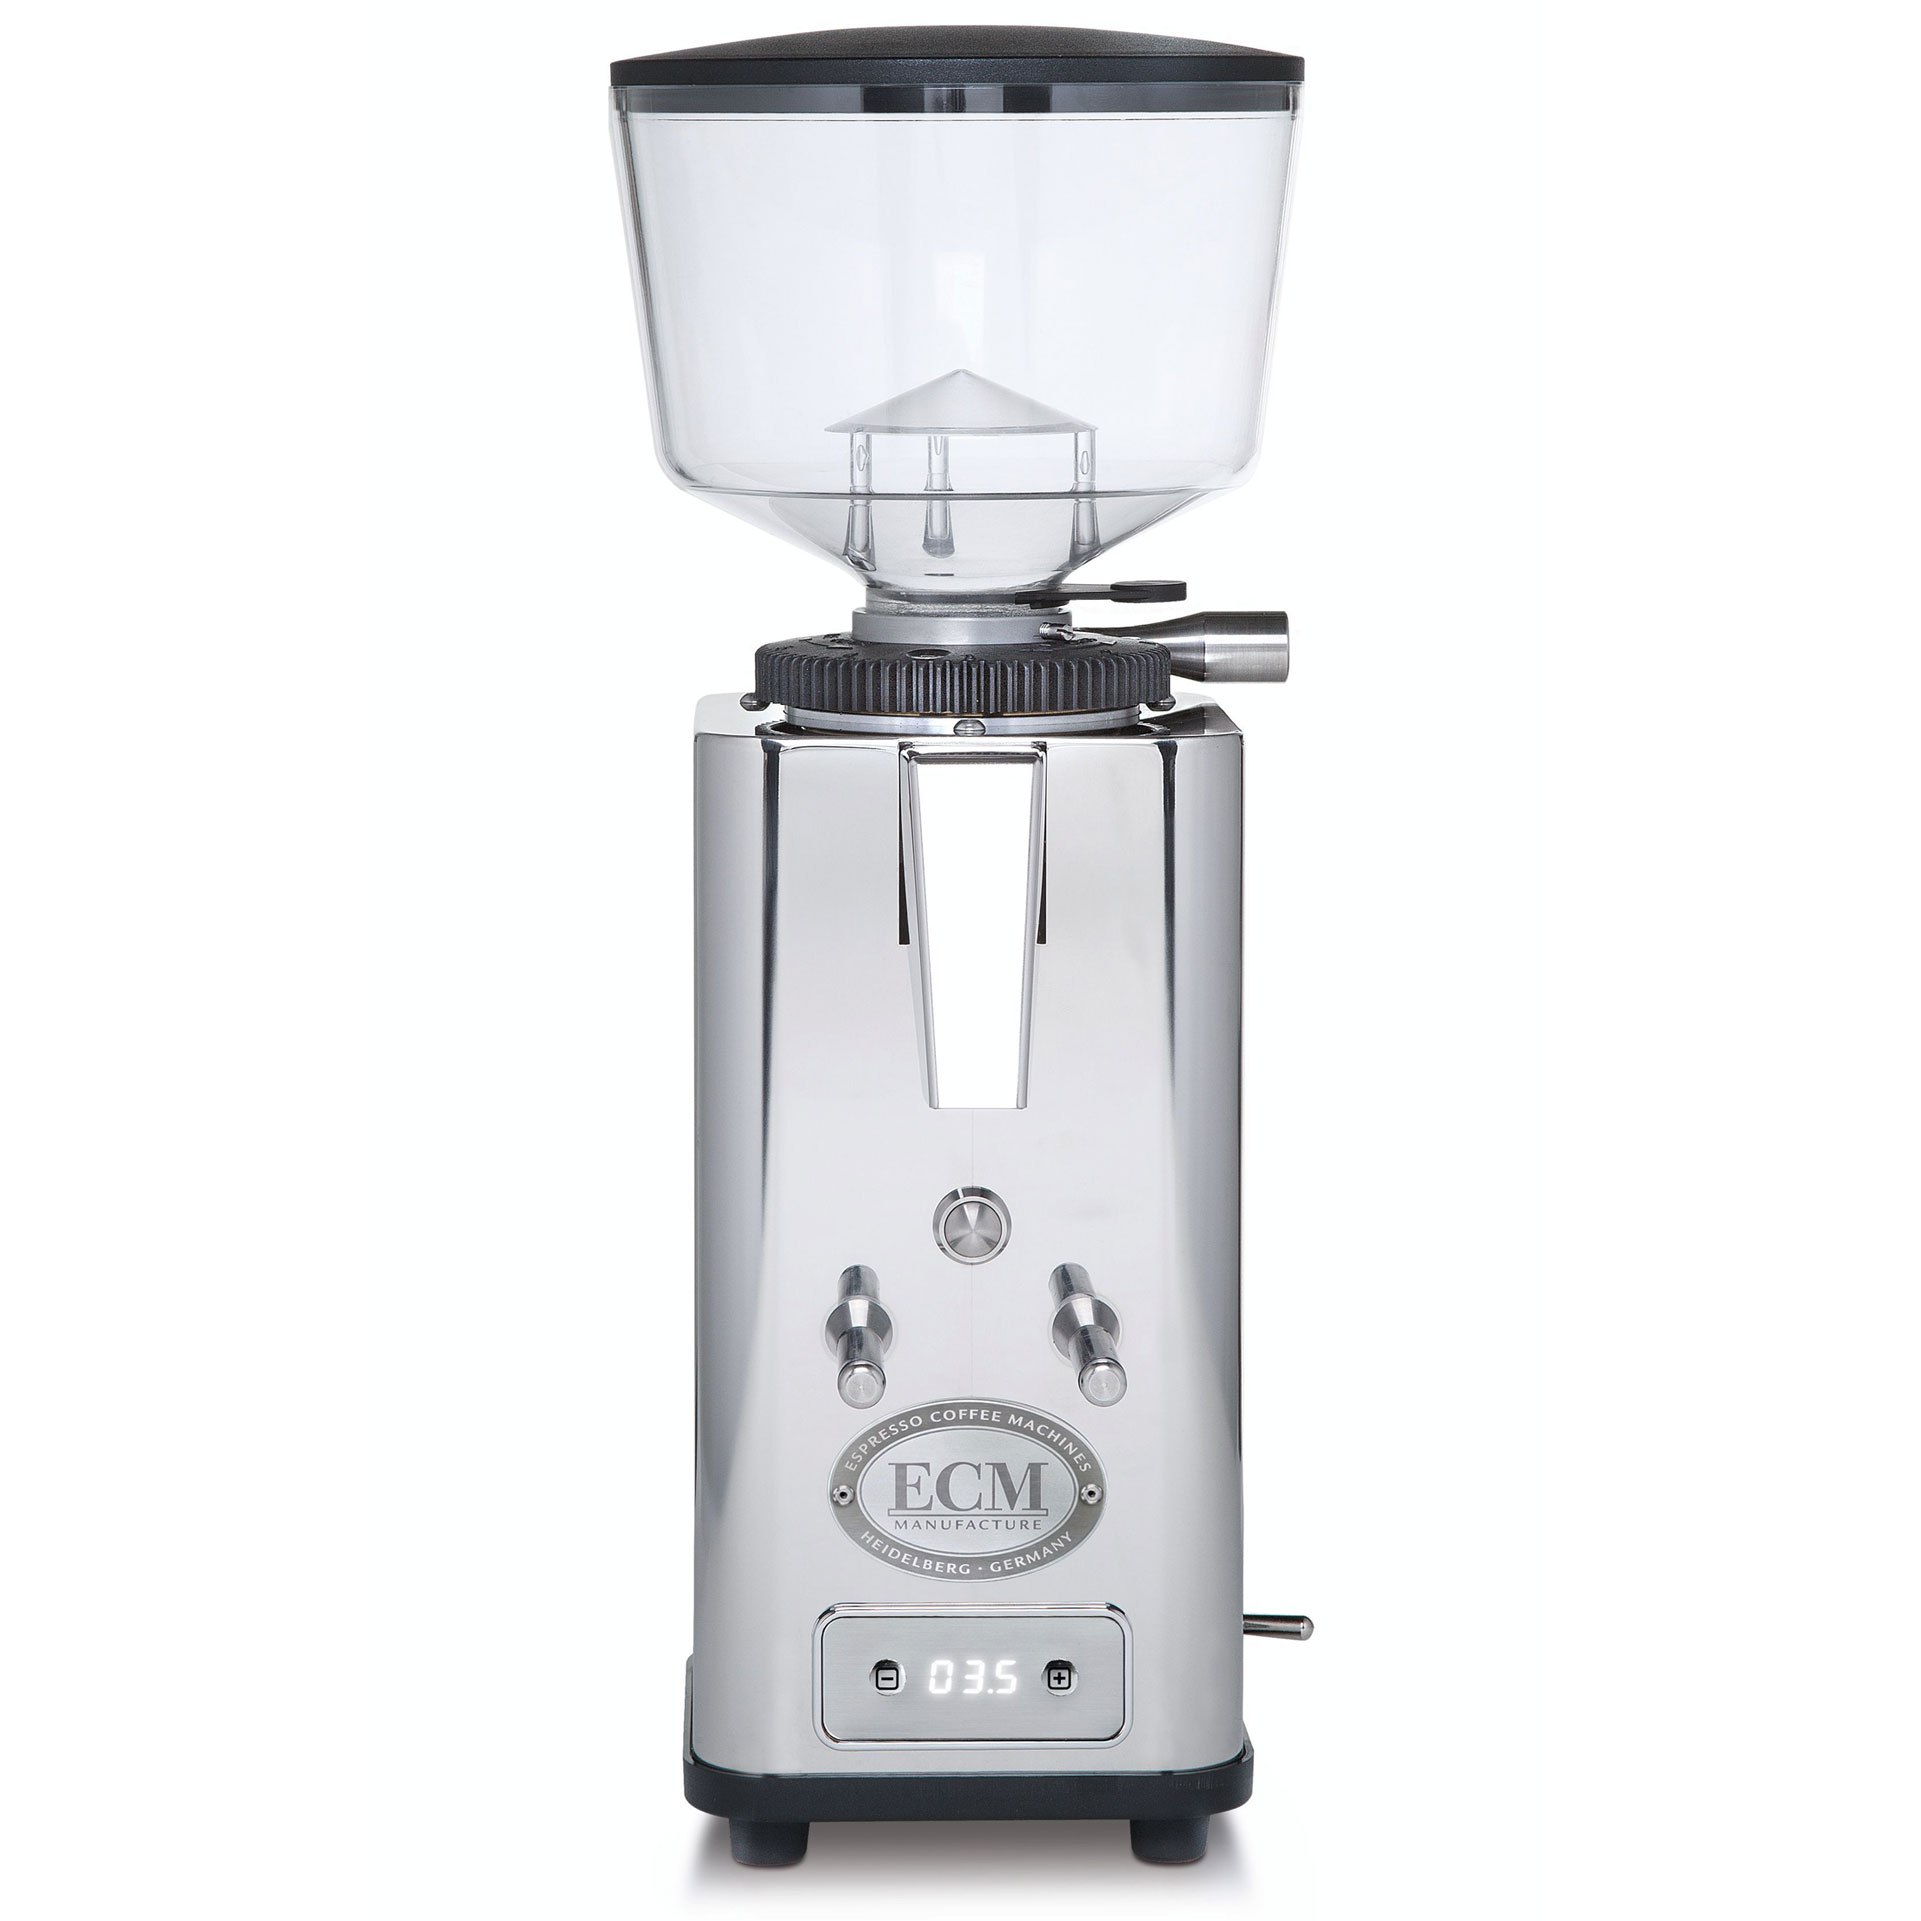 ECM S-Automatik 64 - Silber